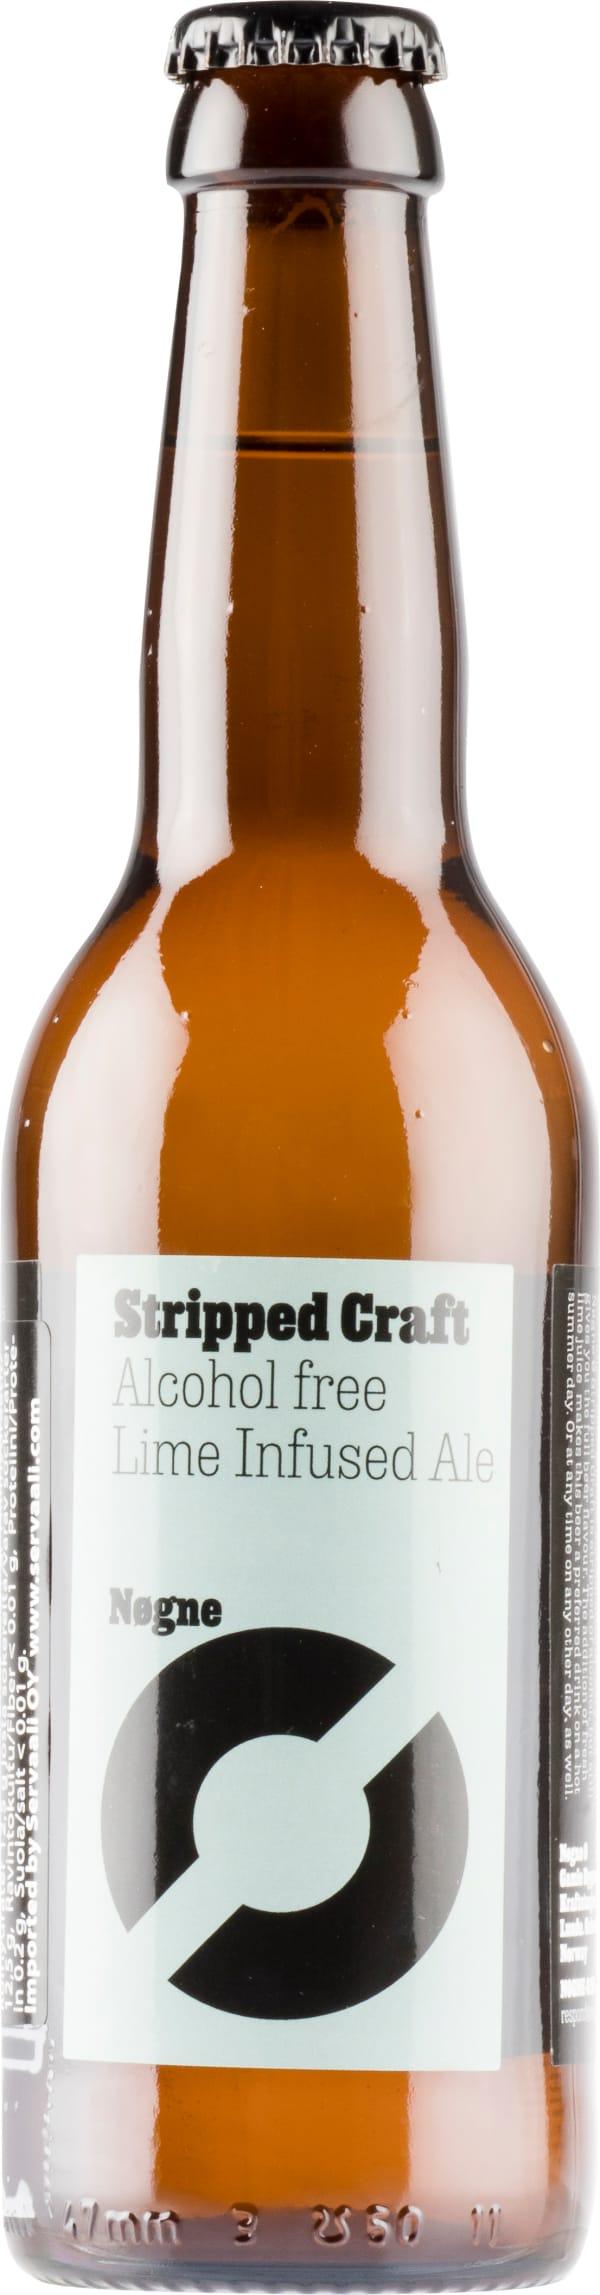 Nøgne Ø Stripped Craft